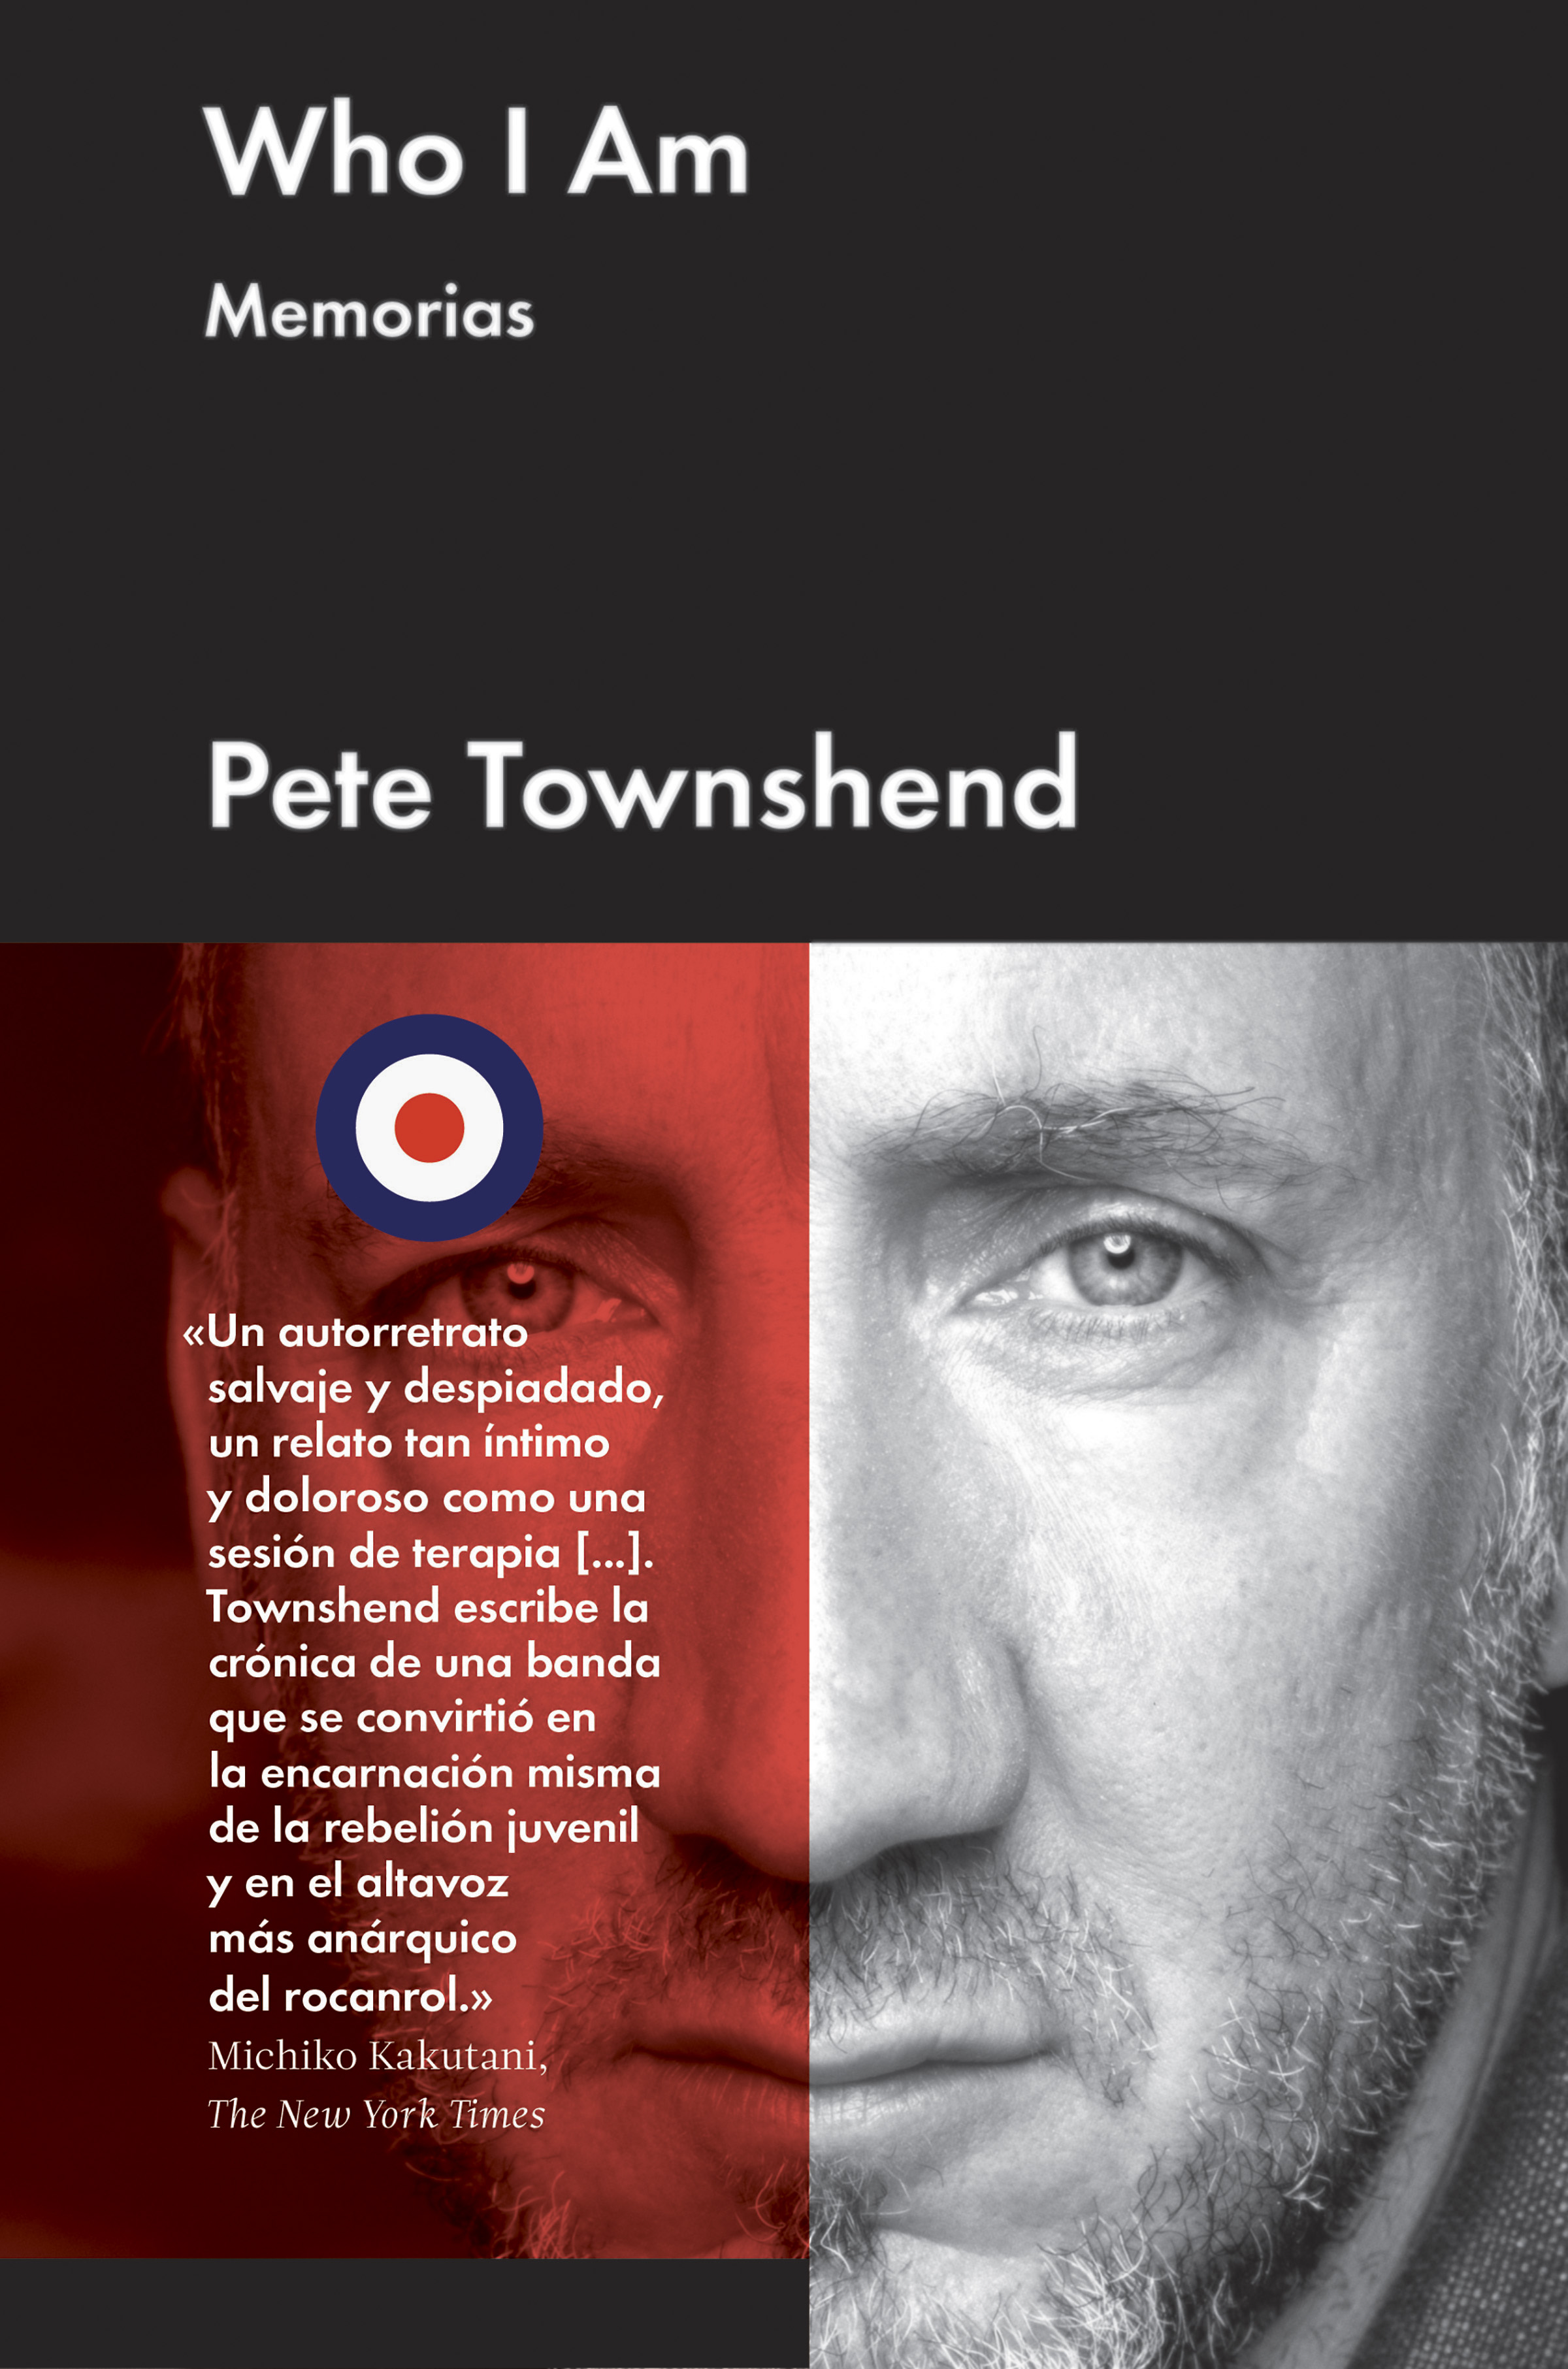 Pete Townshend Who I am pete townshend pete townshend psychoderelict coloured 2 lp